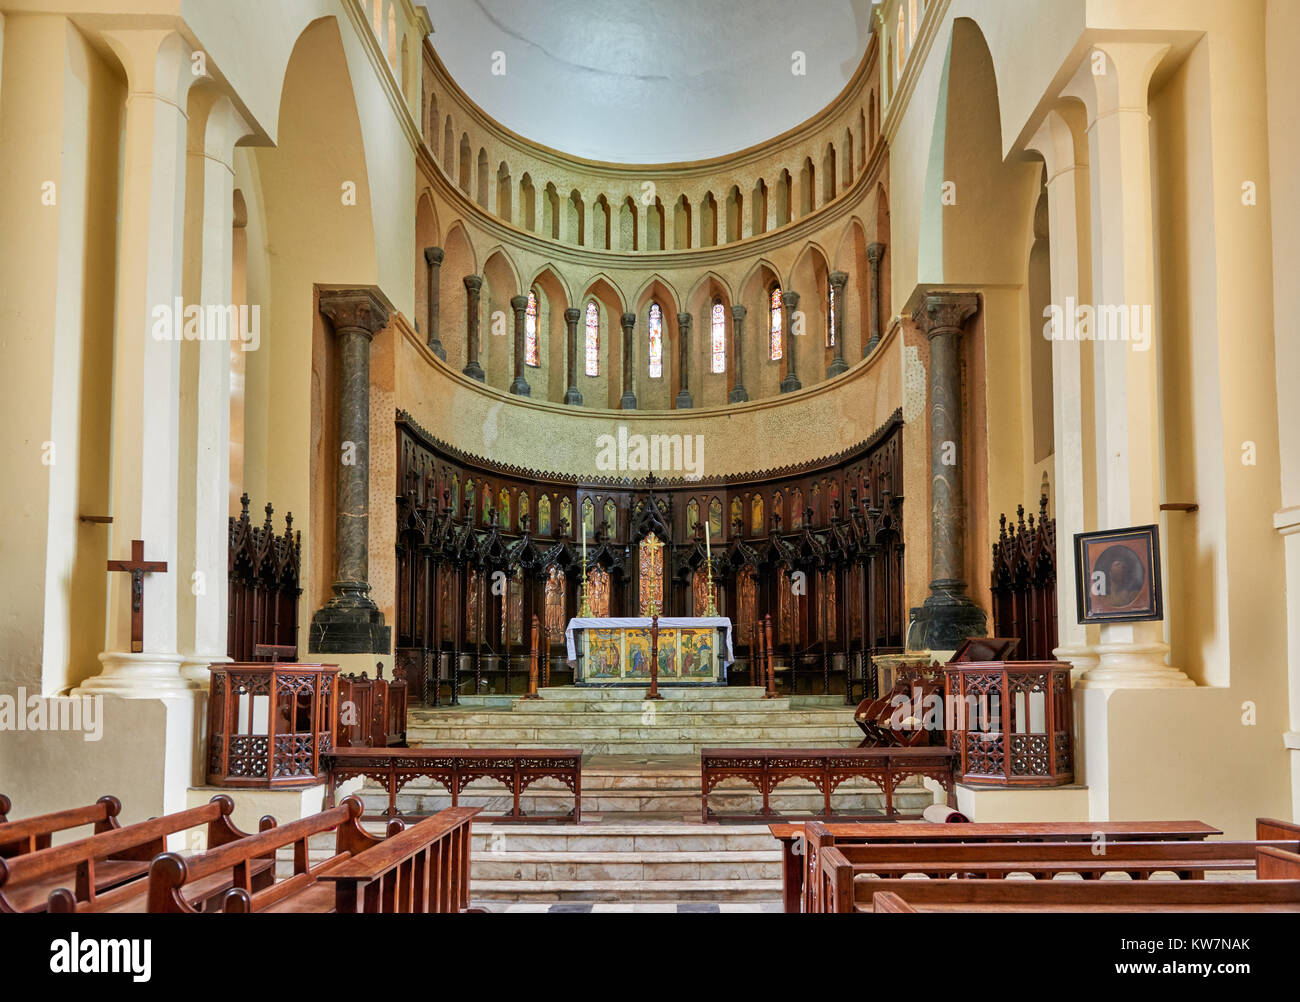 interior shot of Anglican Cathedral in Stone Town, UNESCO World Heritage Site, Zanzibar, Tanzania, Africa - Stock Image